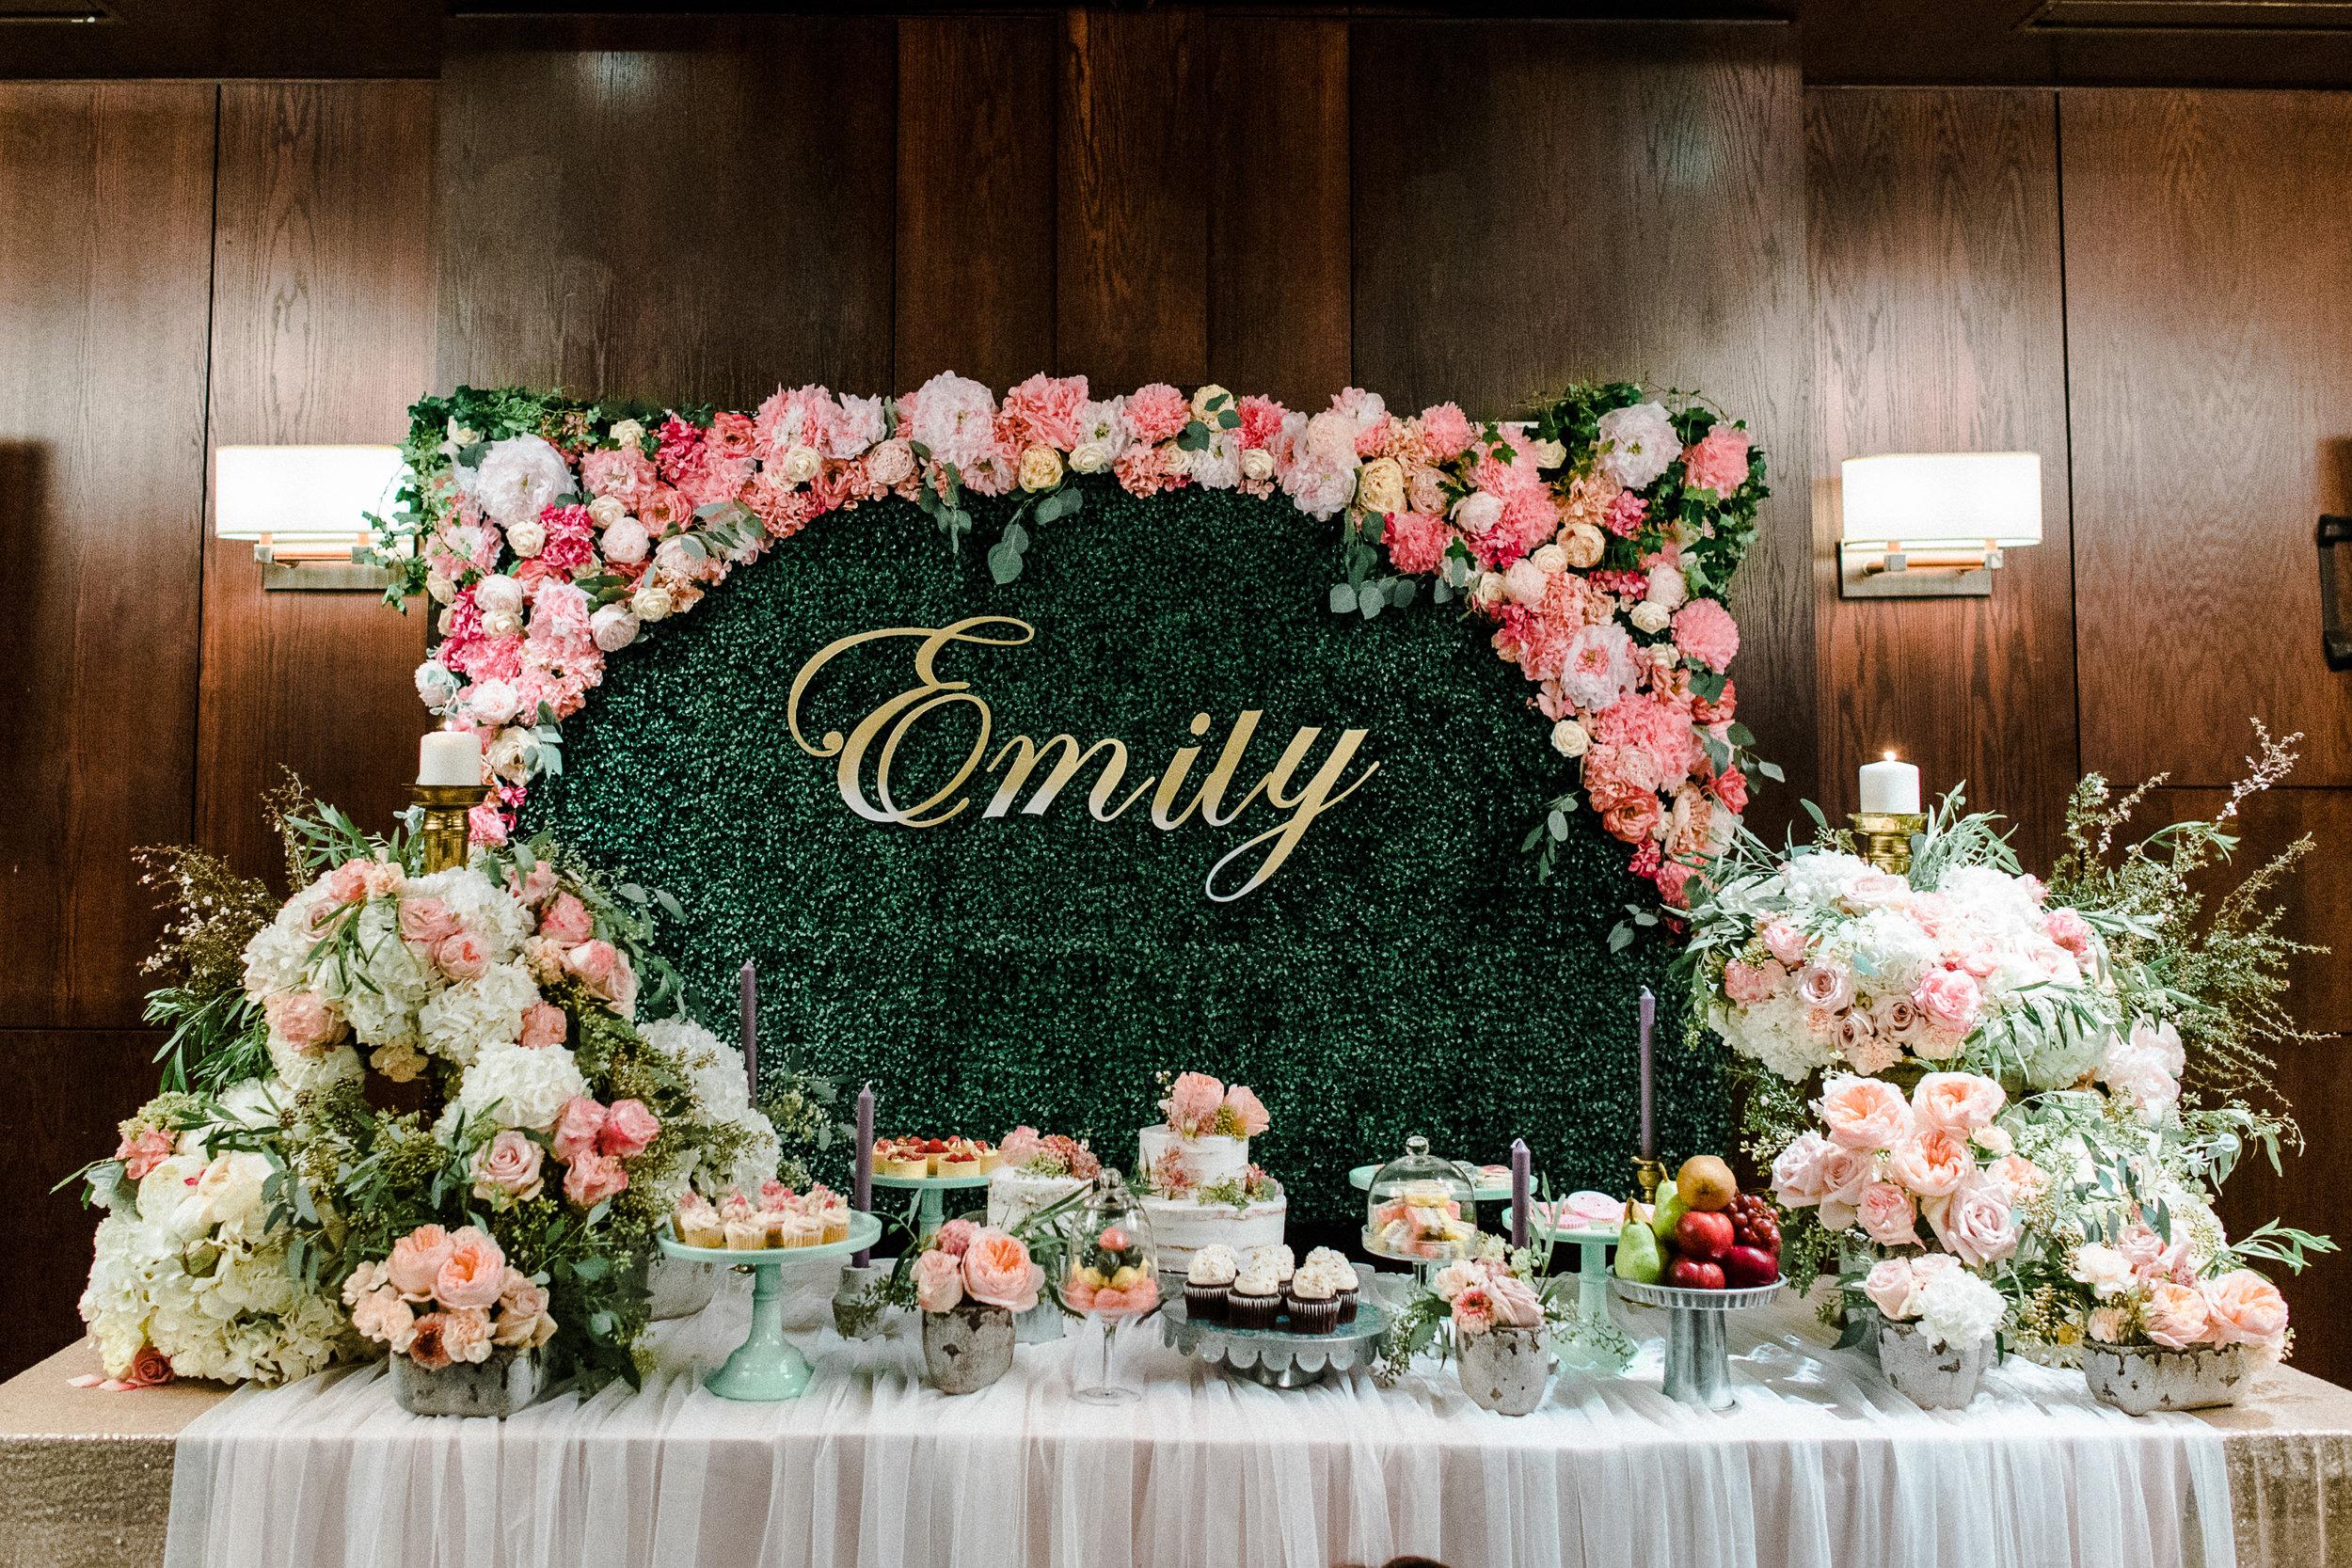 20170305-Emily_Dol-12636.jpg